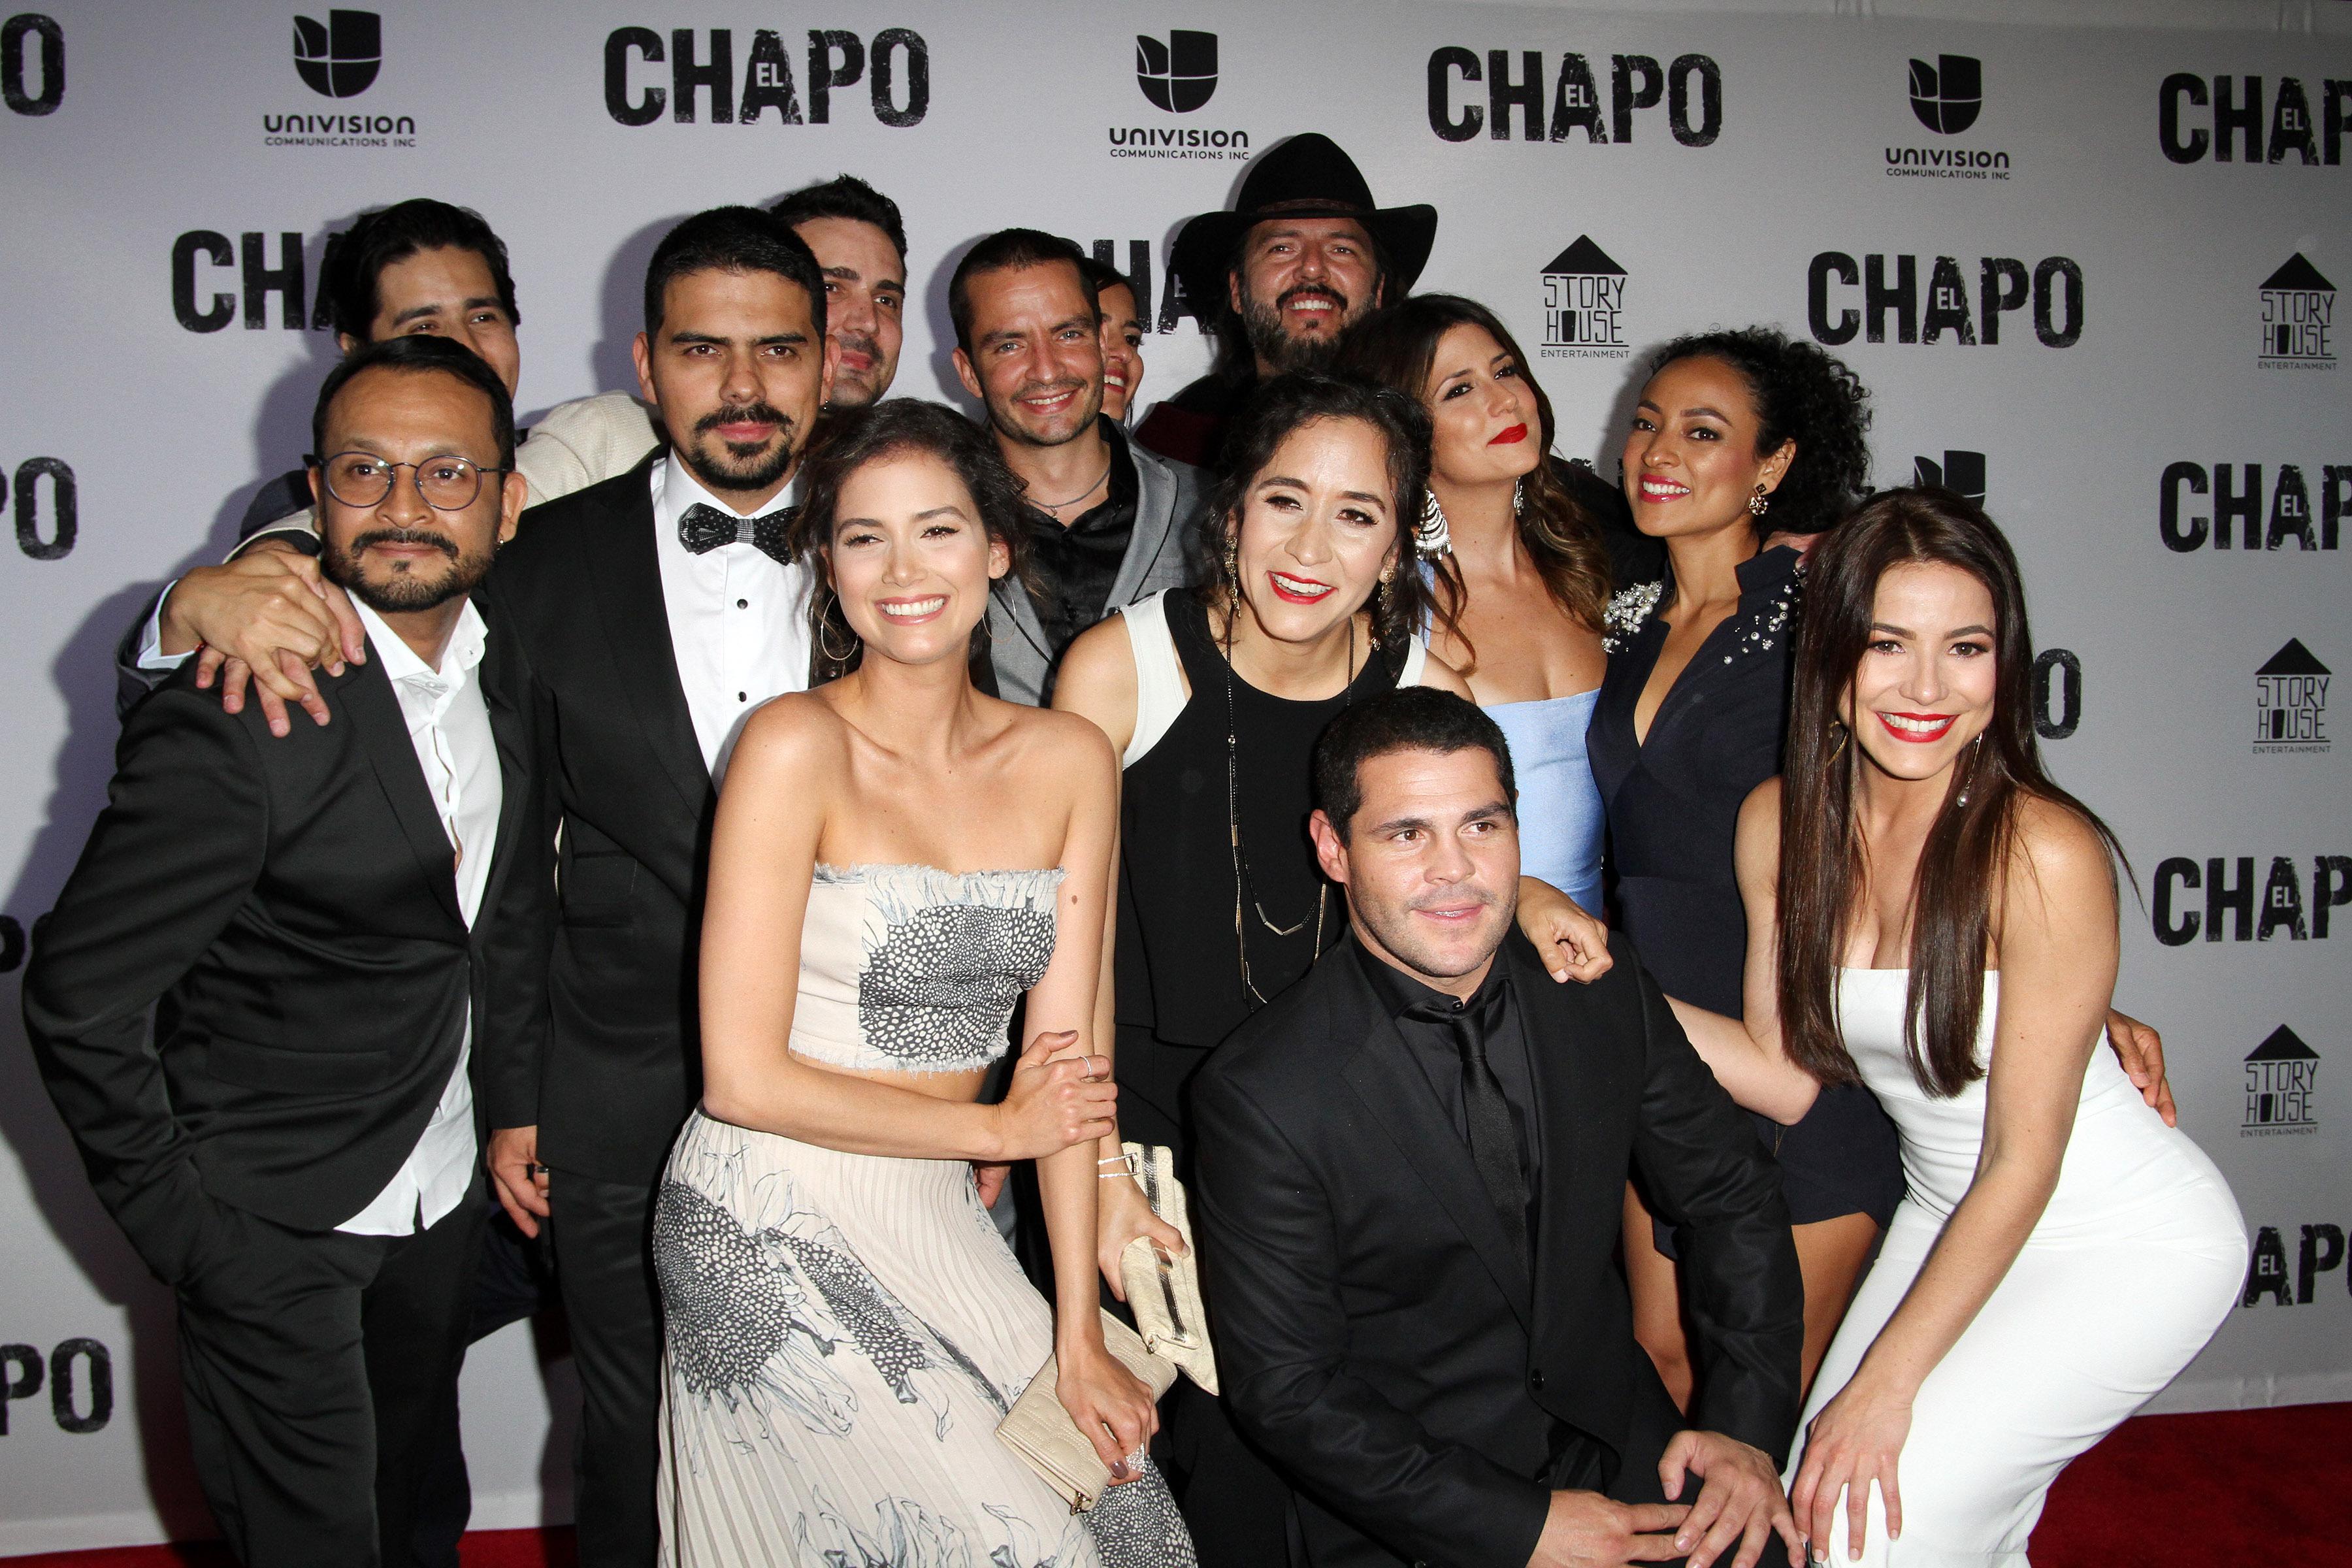 u0026 39 el chapo u0026 39  season 2 is now available on netflix